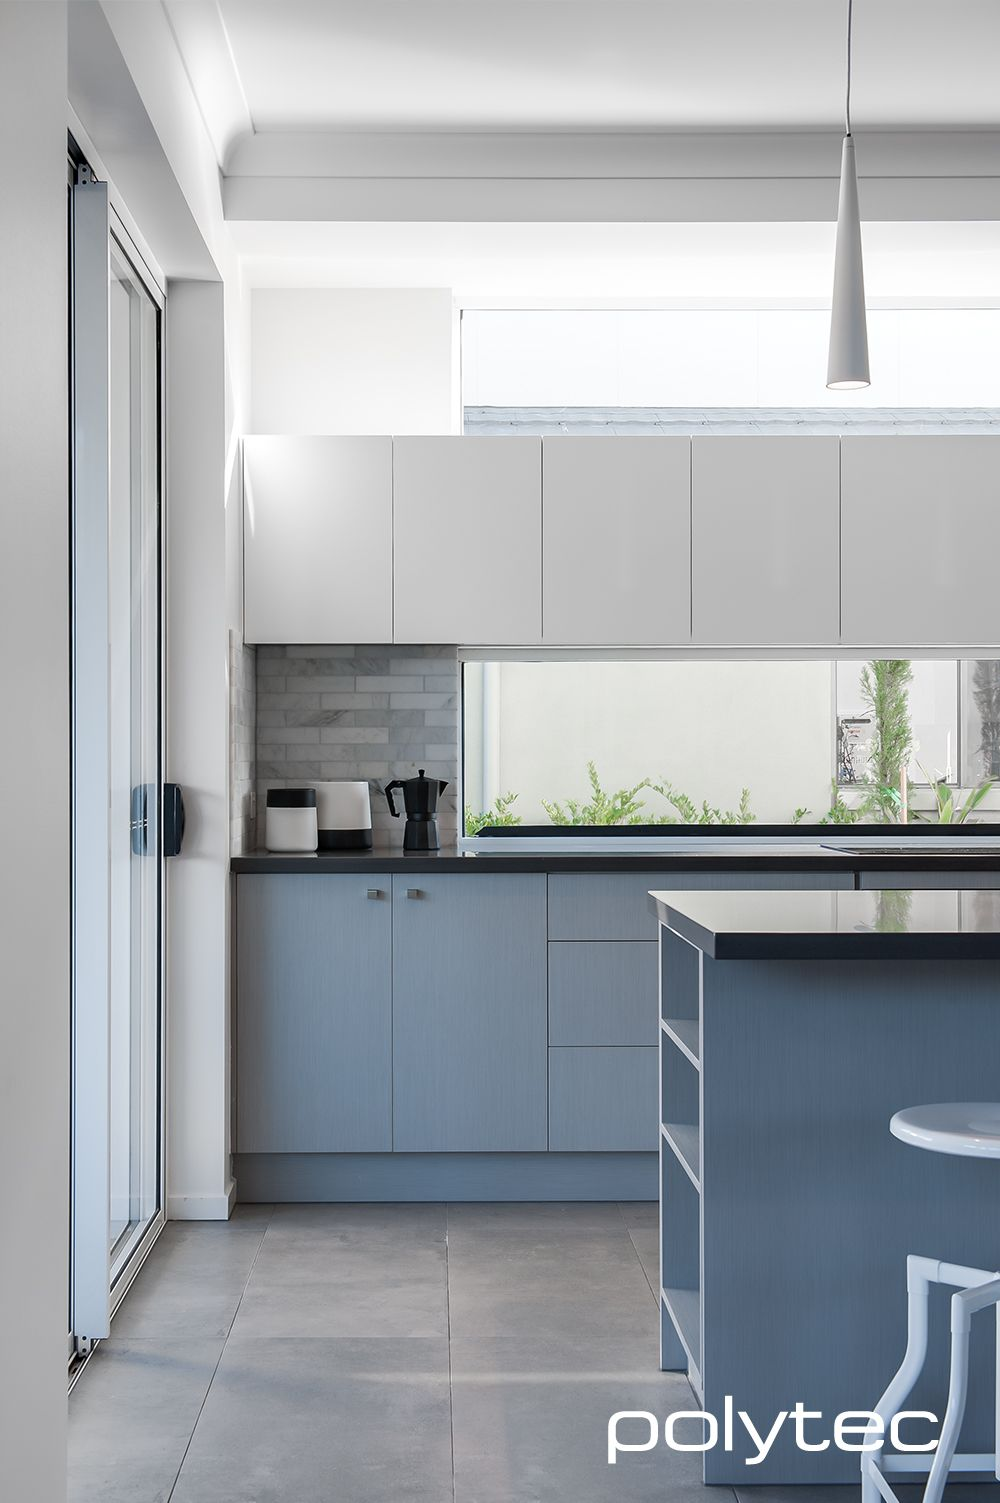 15+ Wondeful Best Sheen For Kitchen Cabinets - Interiors ...